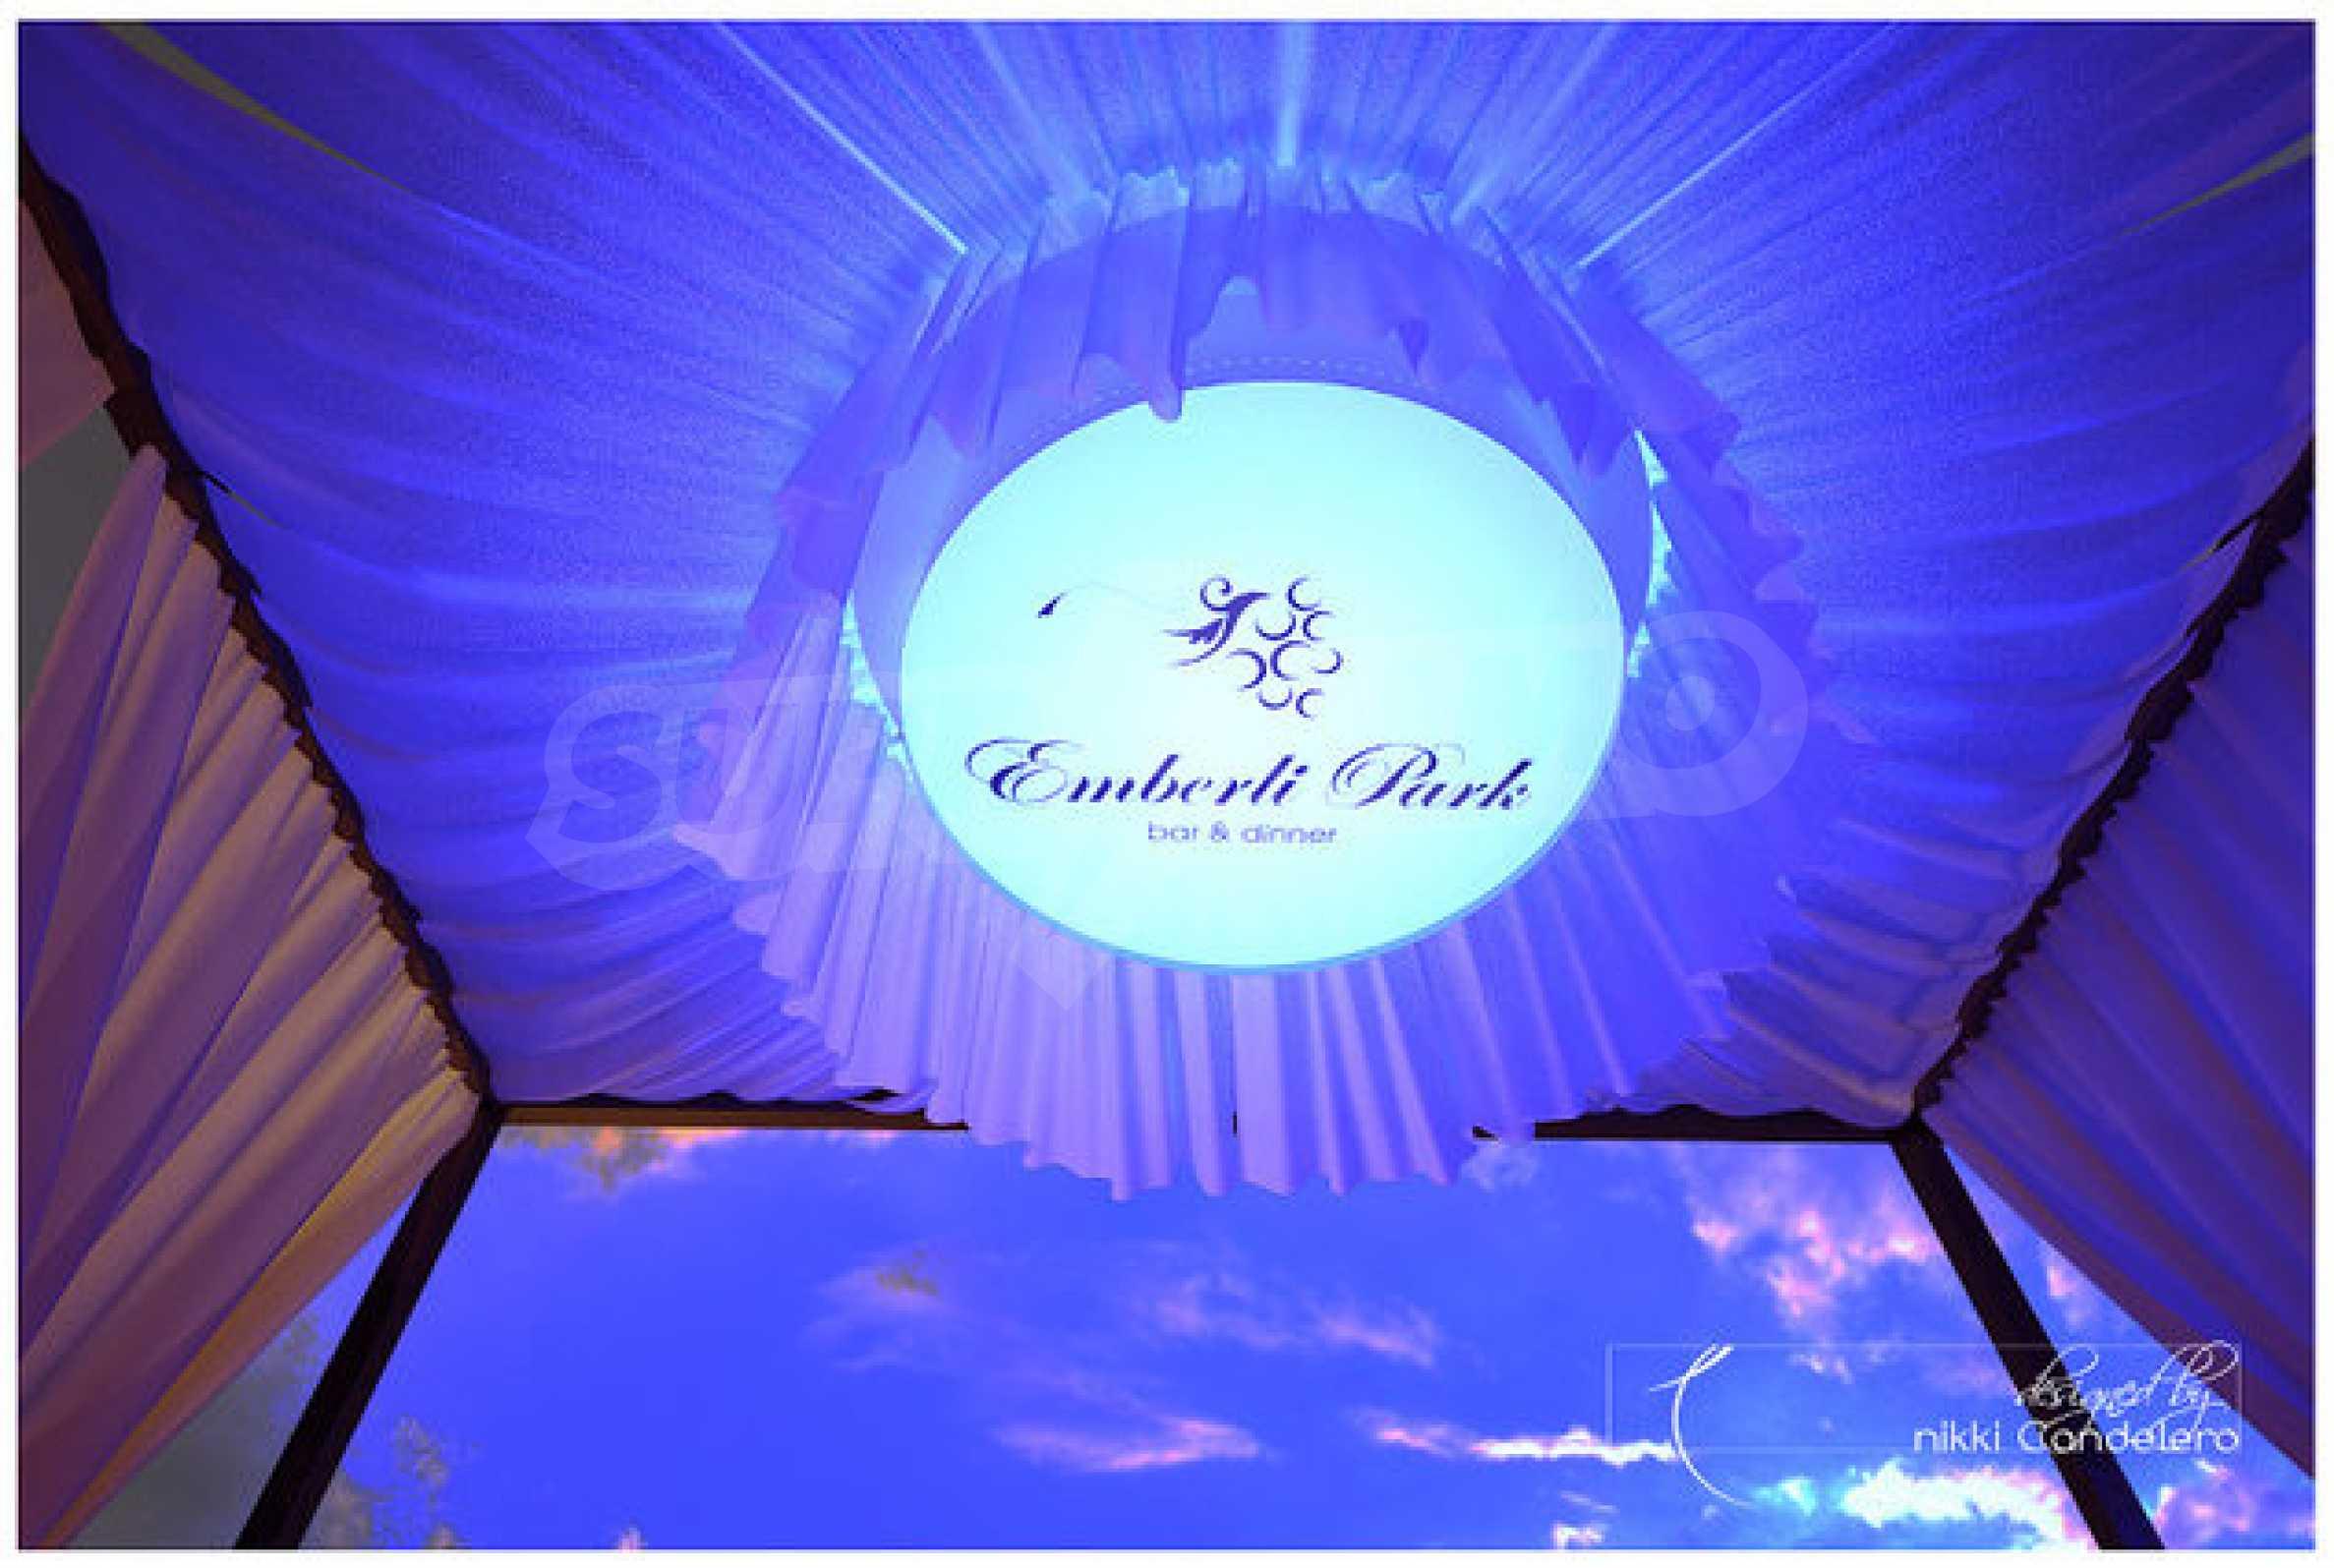 Emberli Park Bar & Diner in the beach resort of Lozenets 5